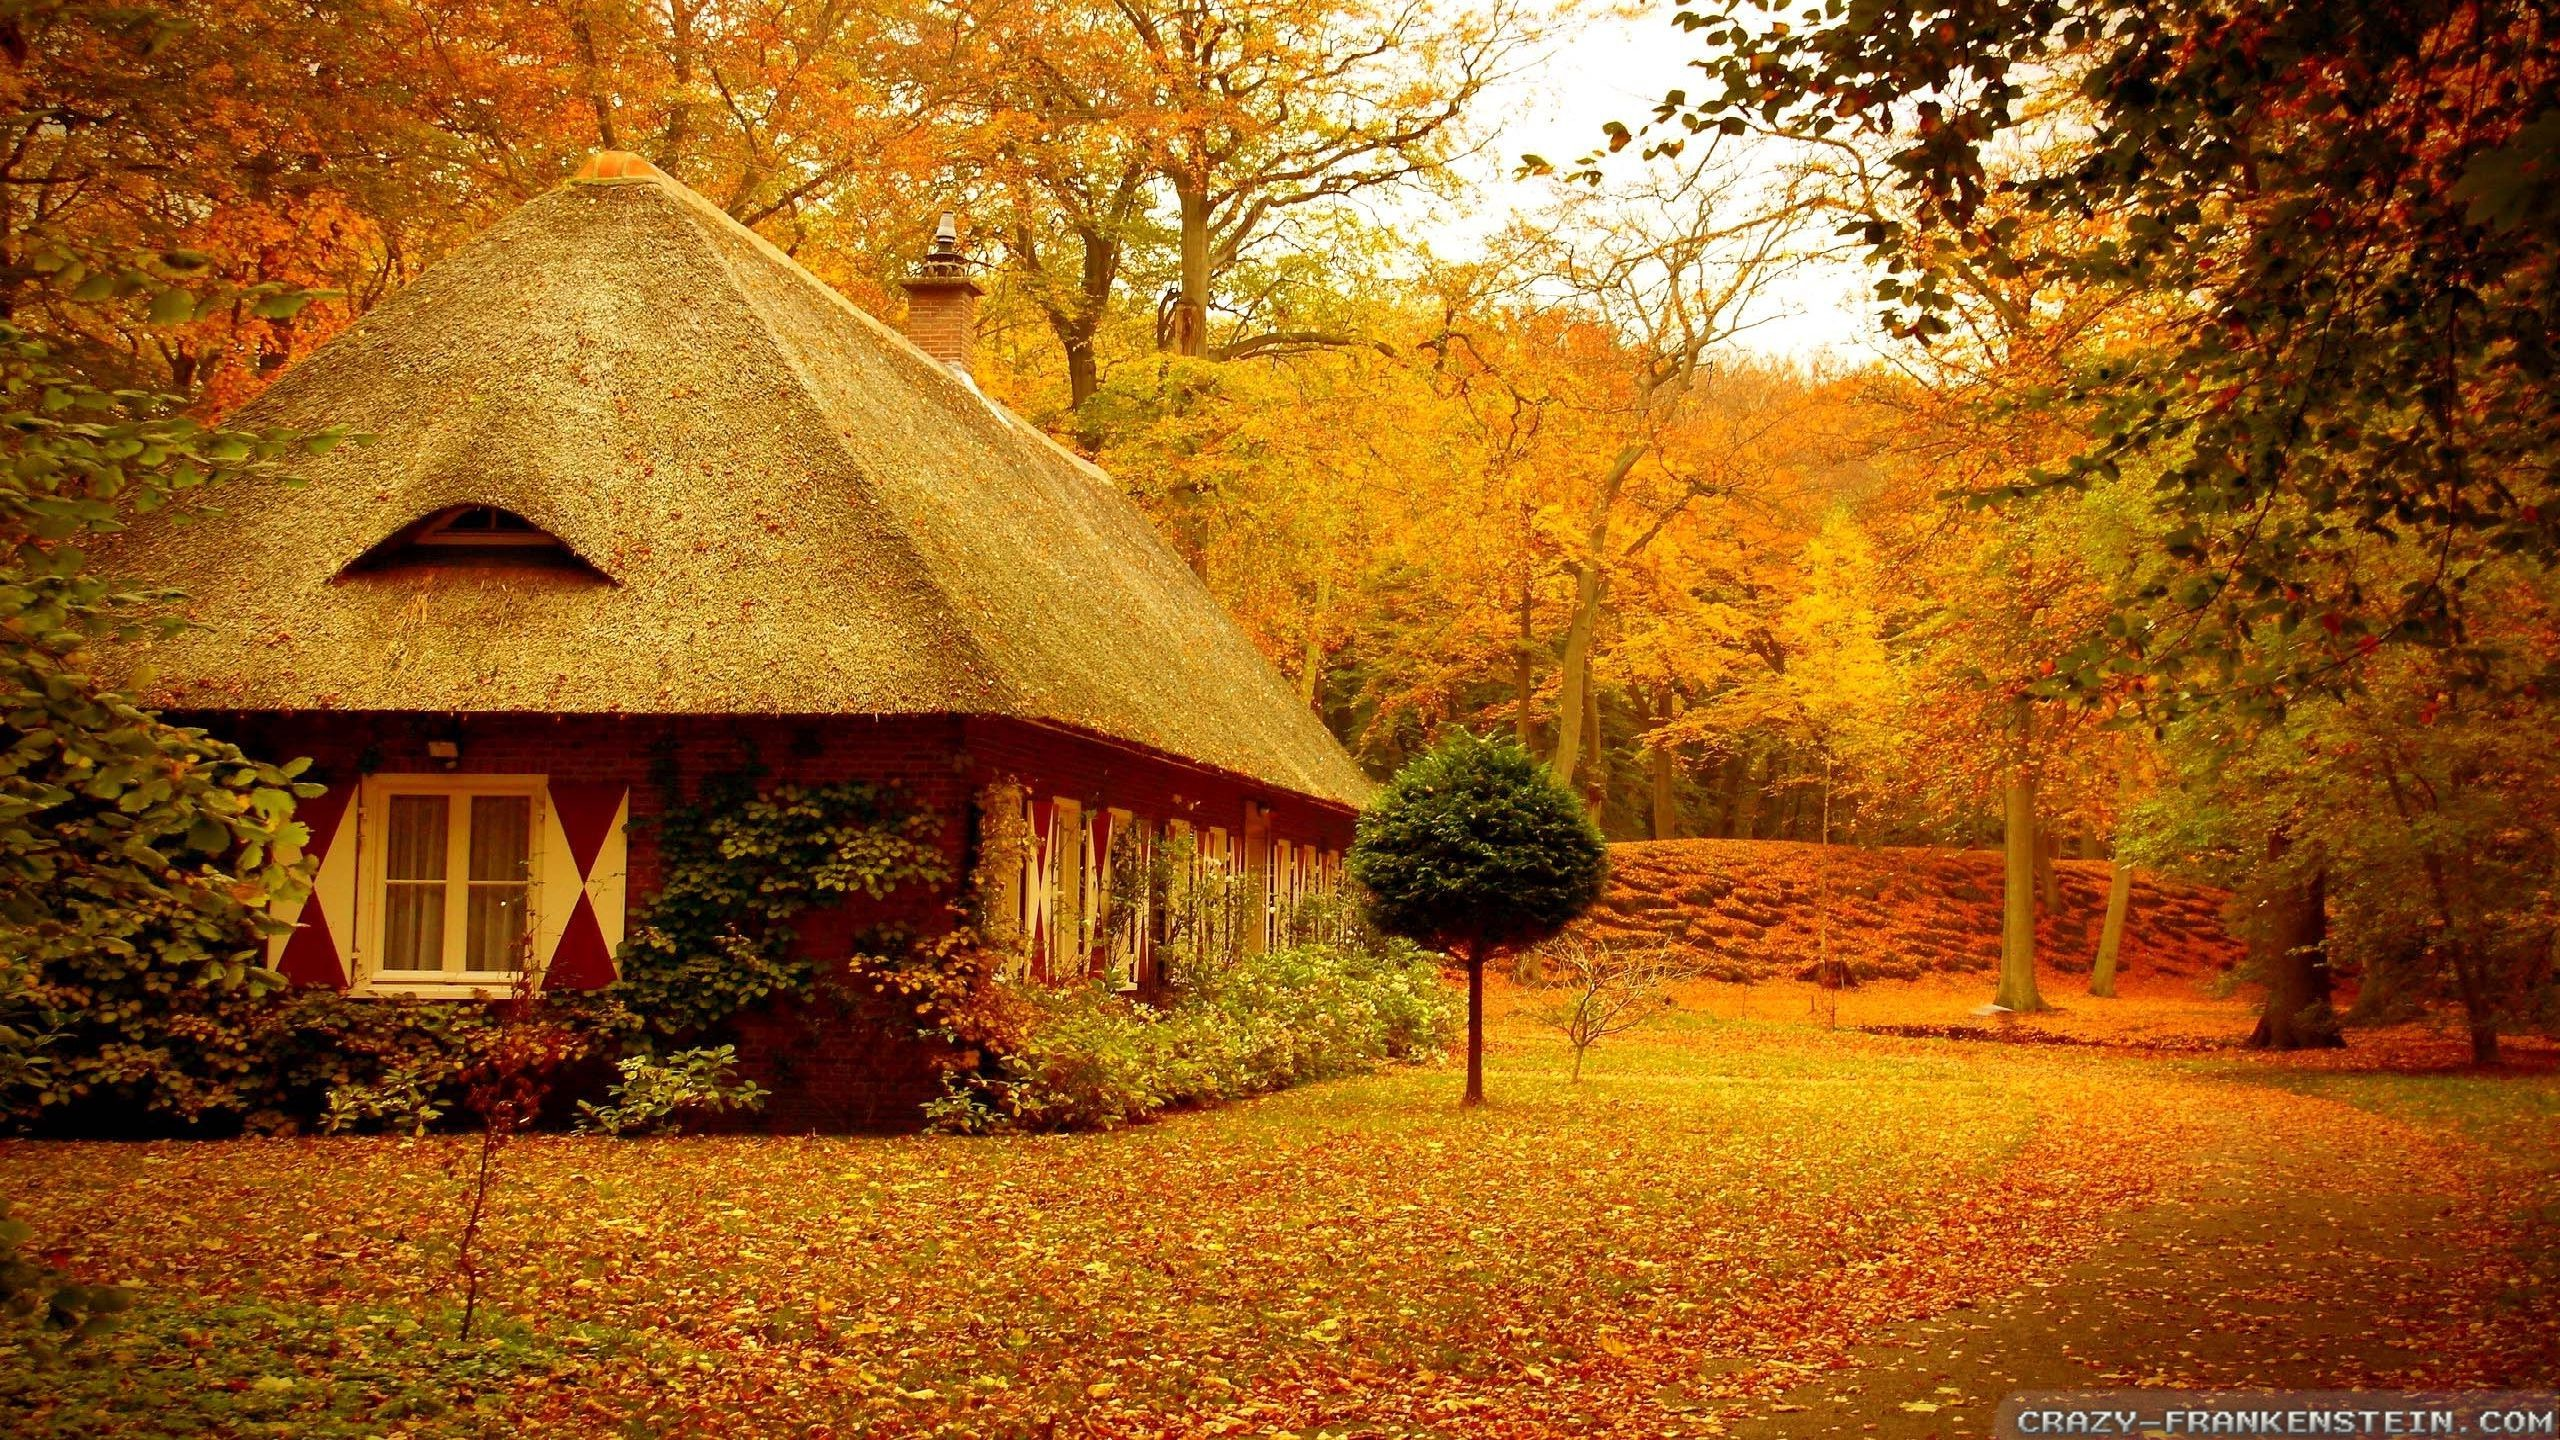 Free Autumn Desktop Screensavers: Autumn Screensavers Wallpaper (57+ Images